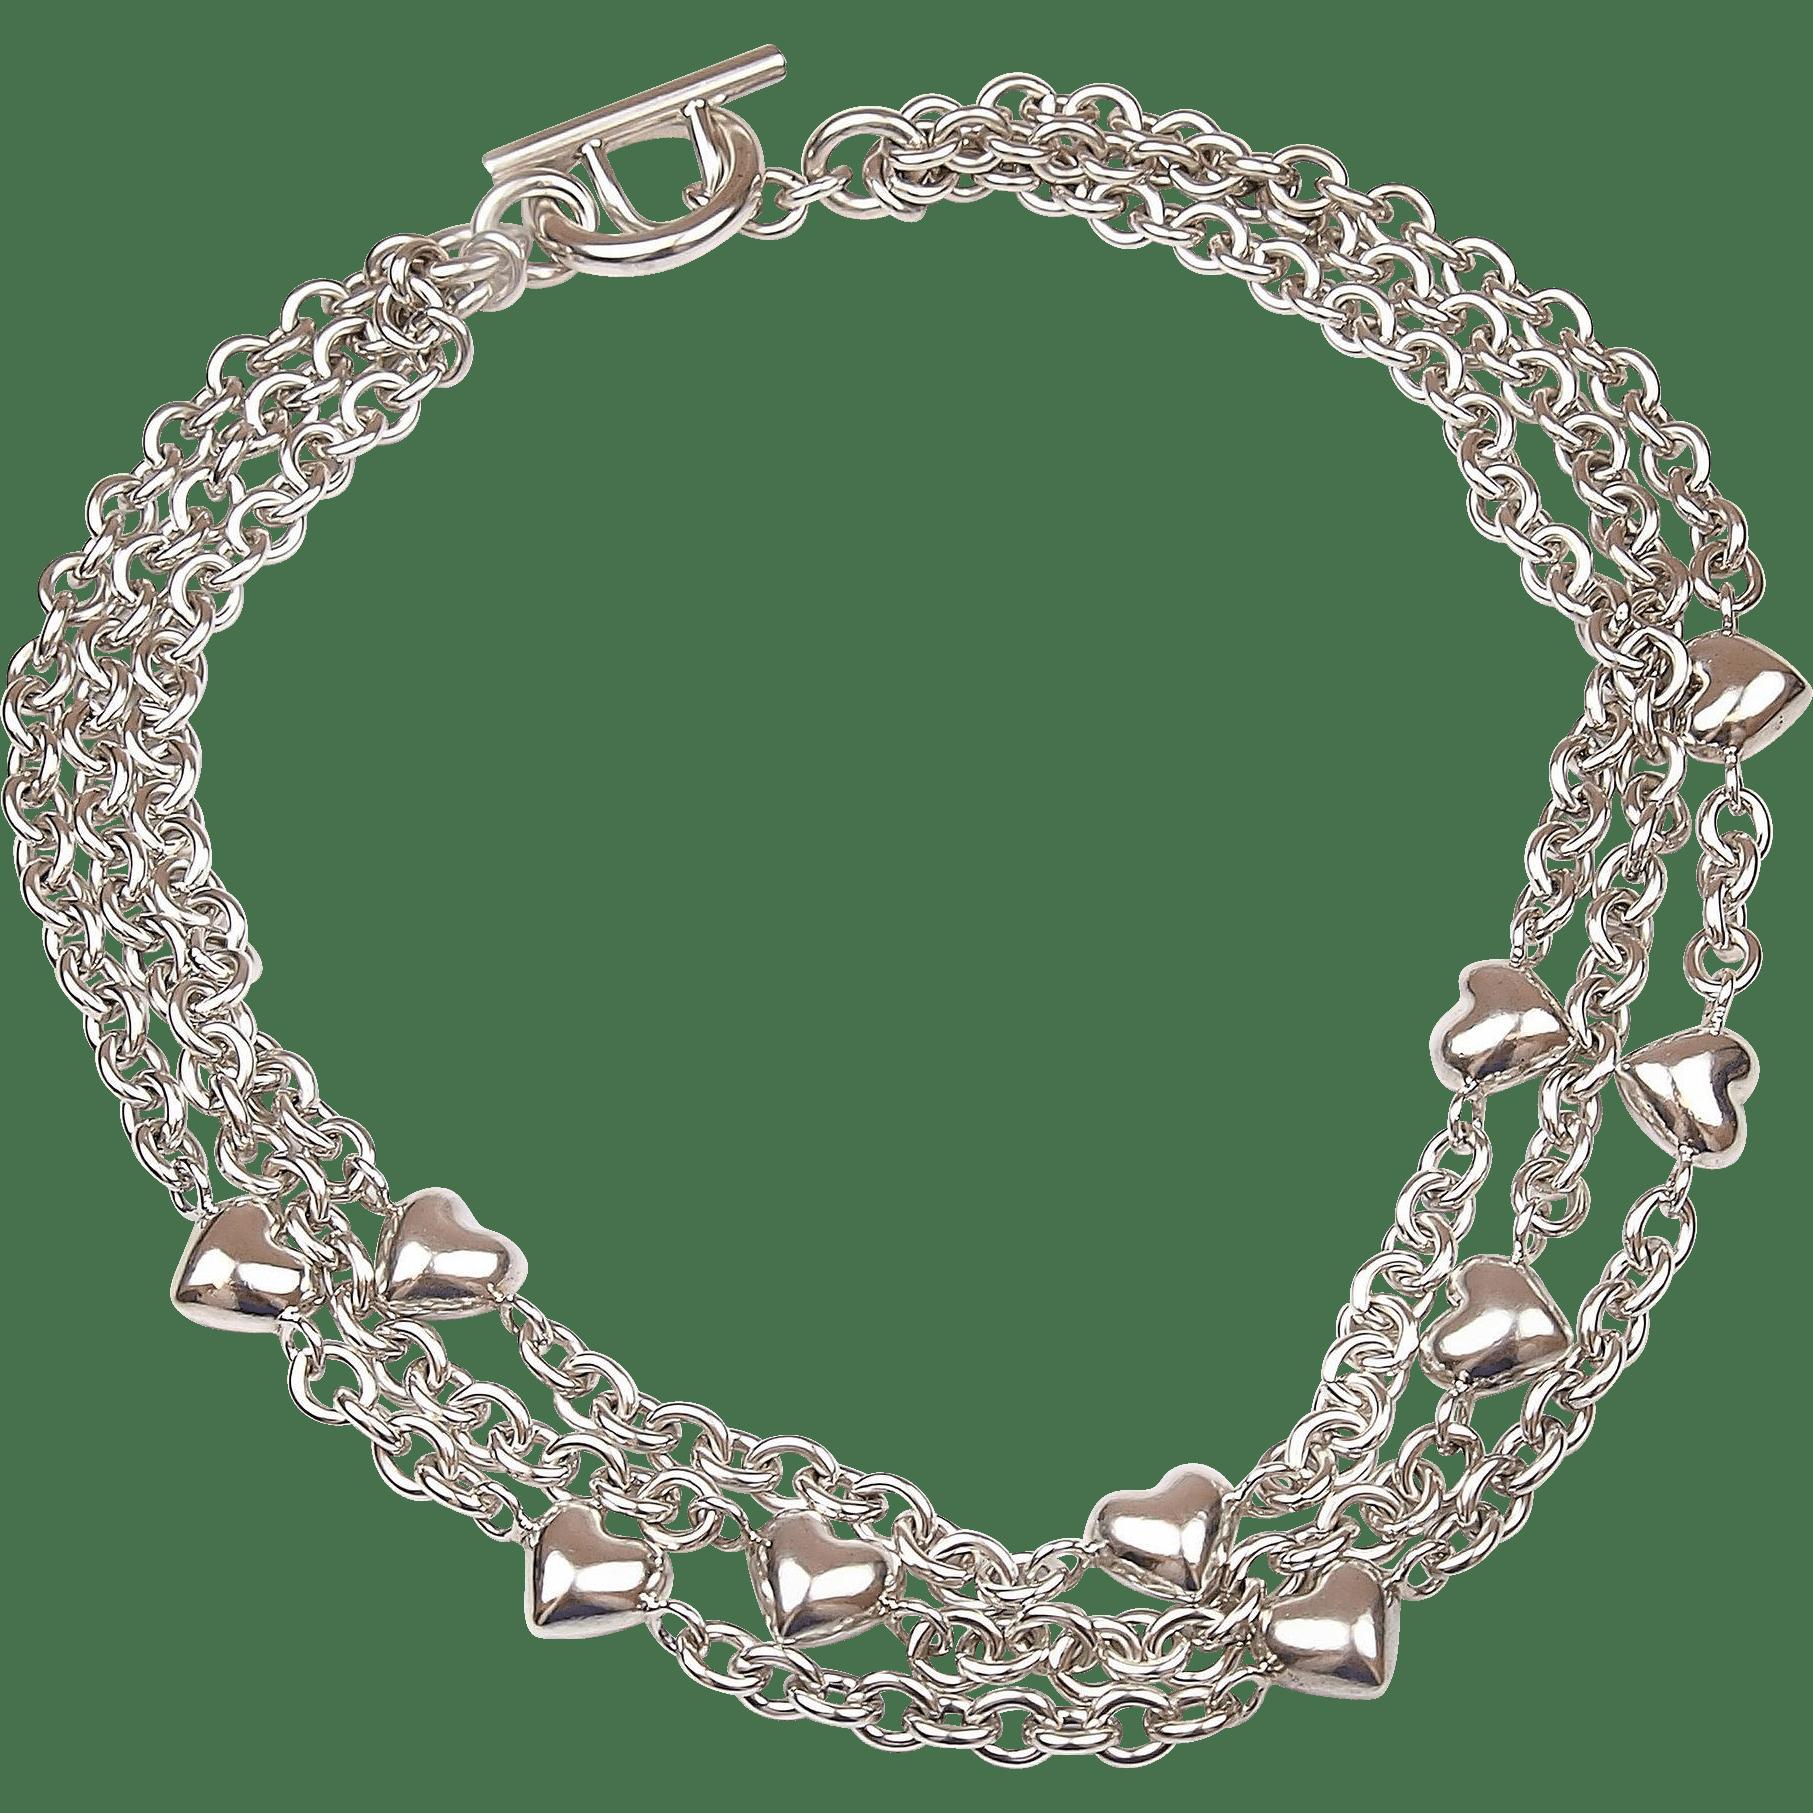 Tiffany heart necklace surprising. Clipart designs silver